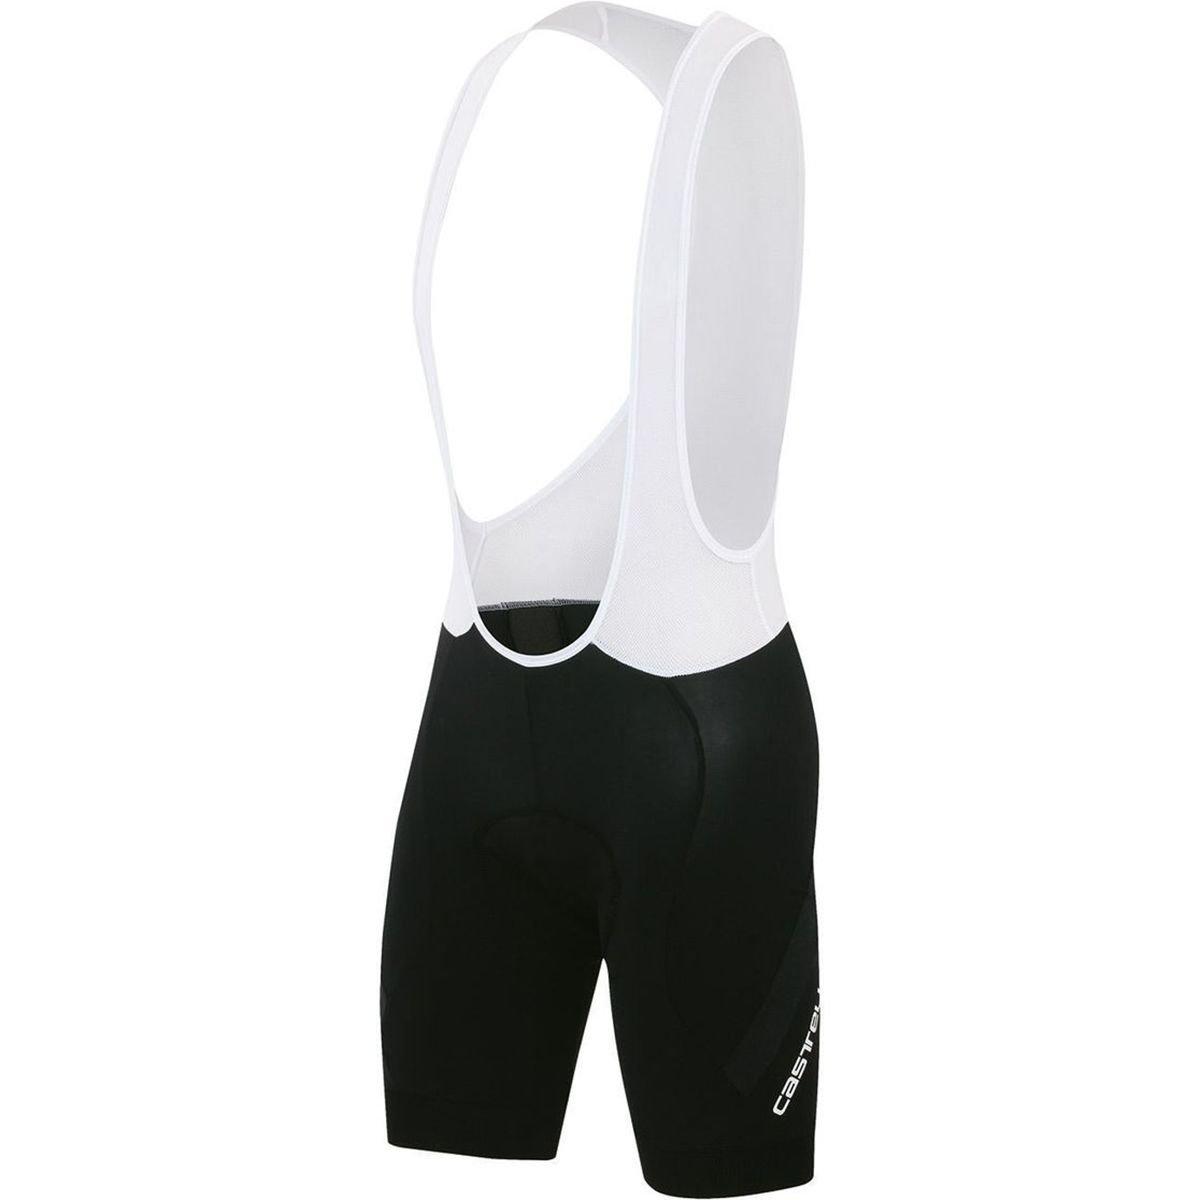 Castelli Endurance X2 Bib Short - Men's Black, S